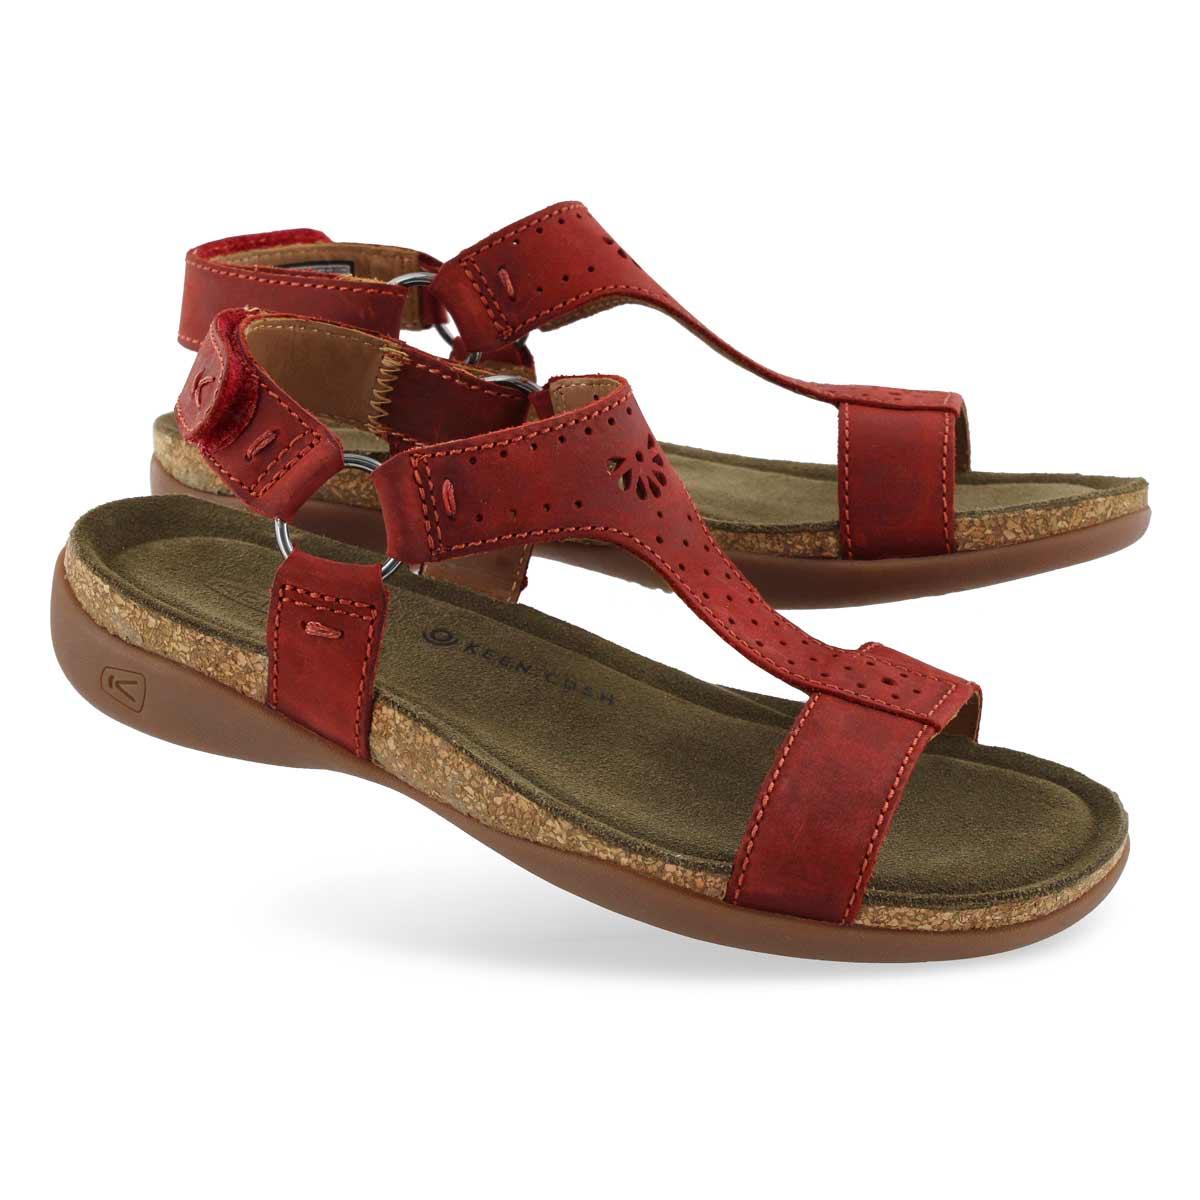 Lds Kaci Ana bossa nova casual sandal